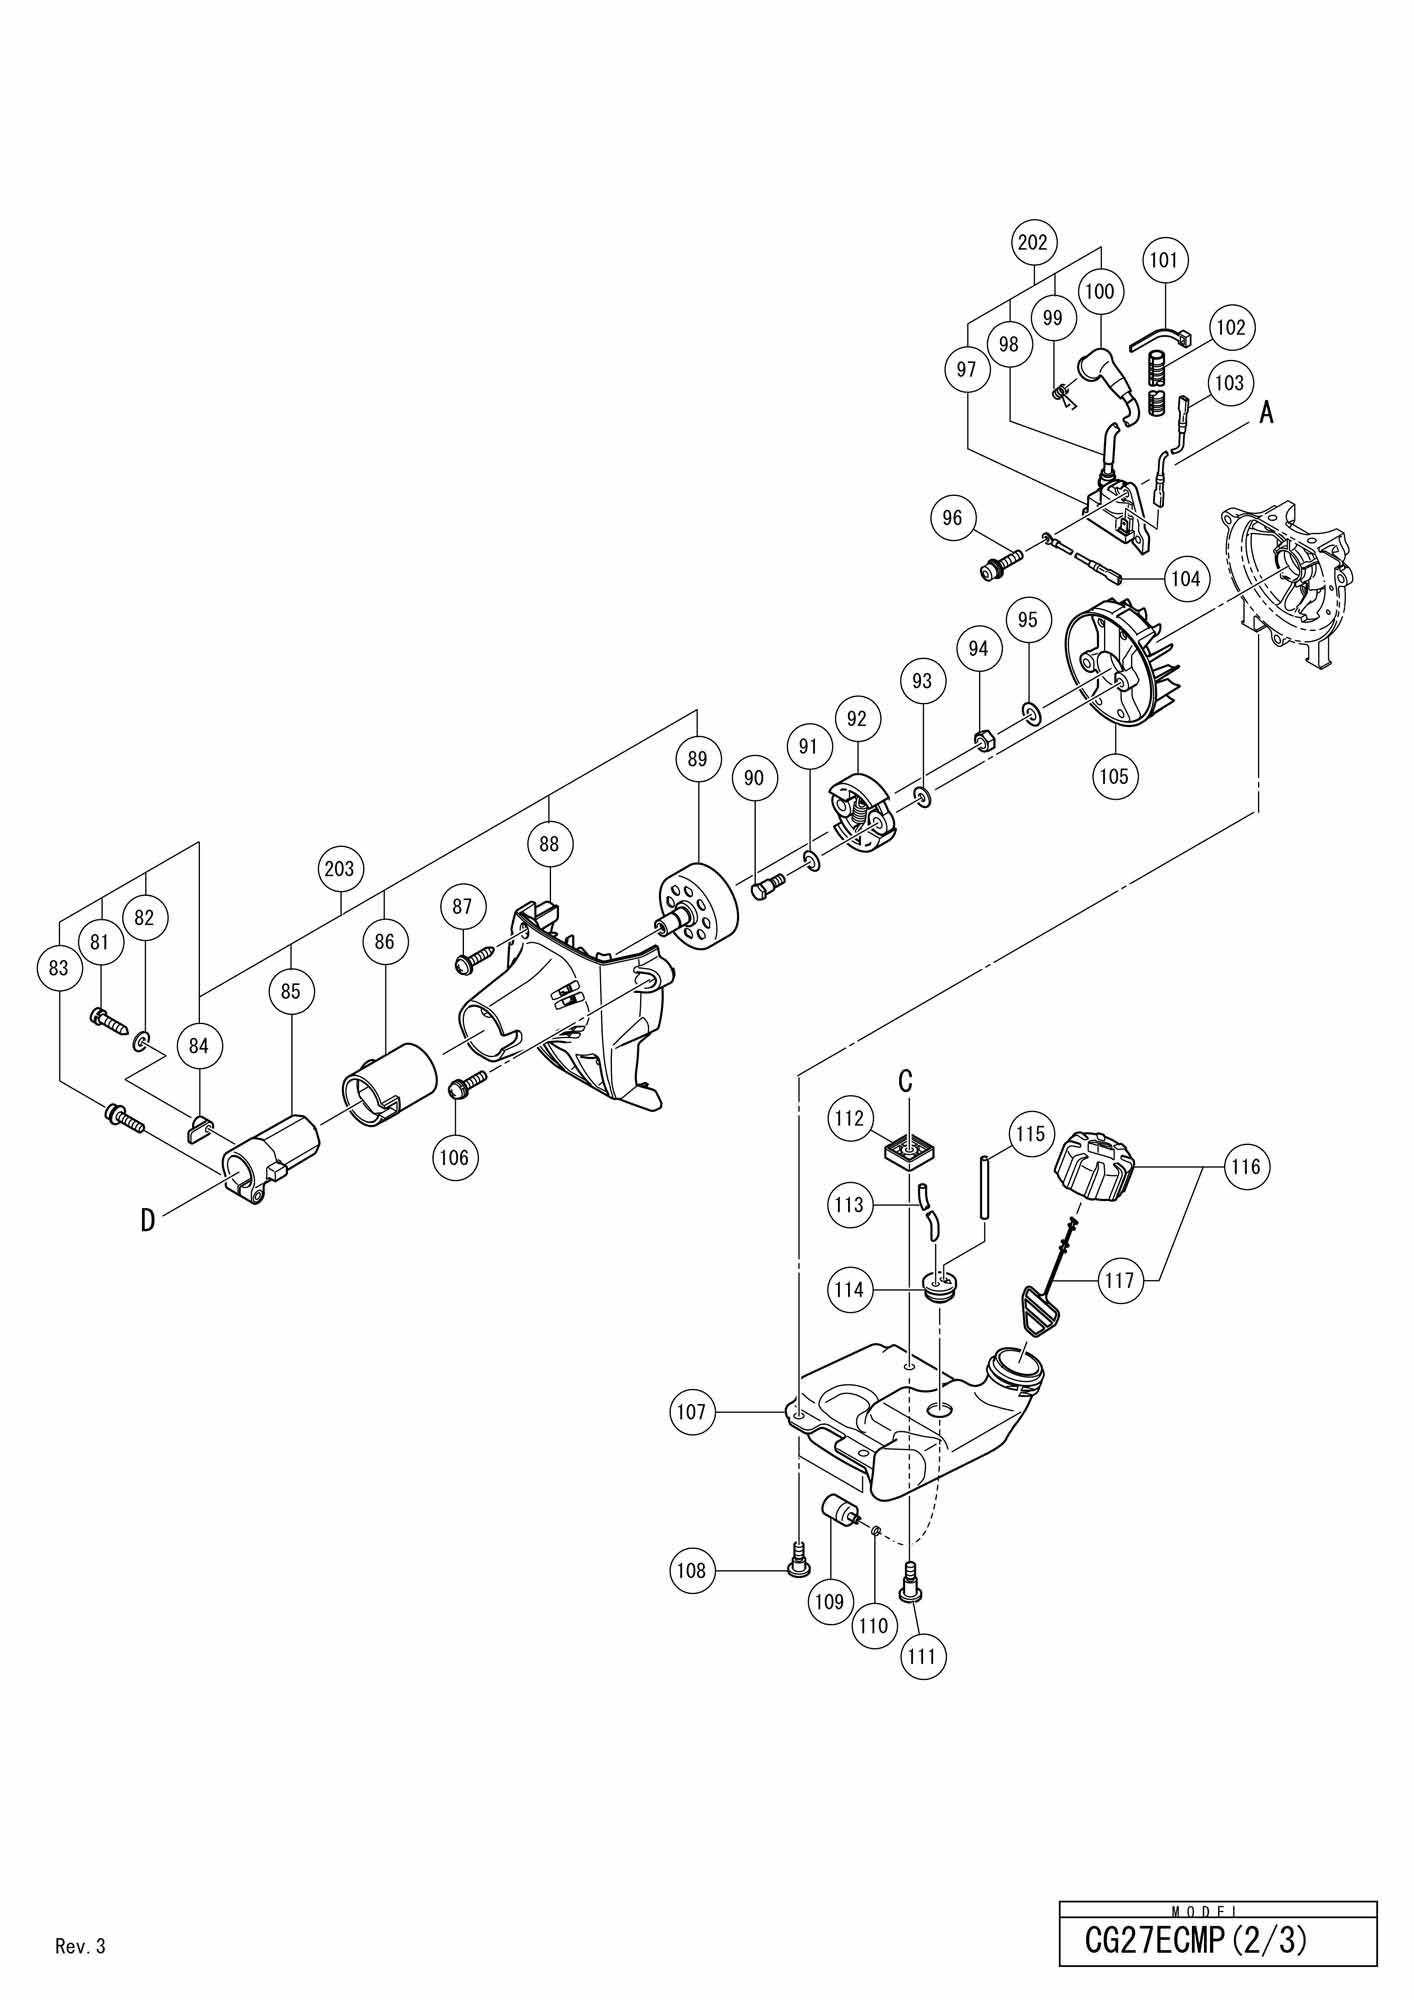 Hitachi Engine Grass Trimmer/brush Cutter Cg 27ecmp SPARE